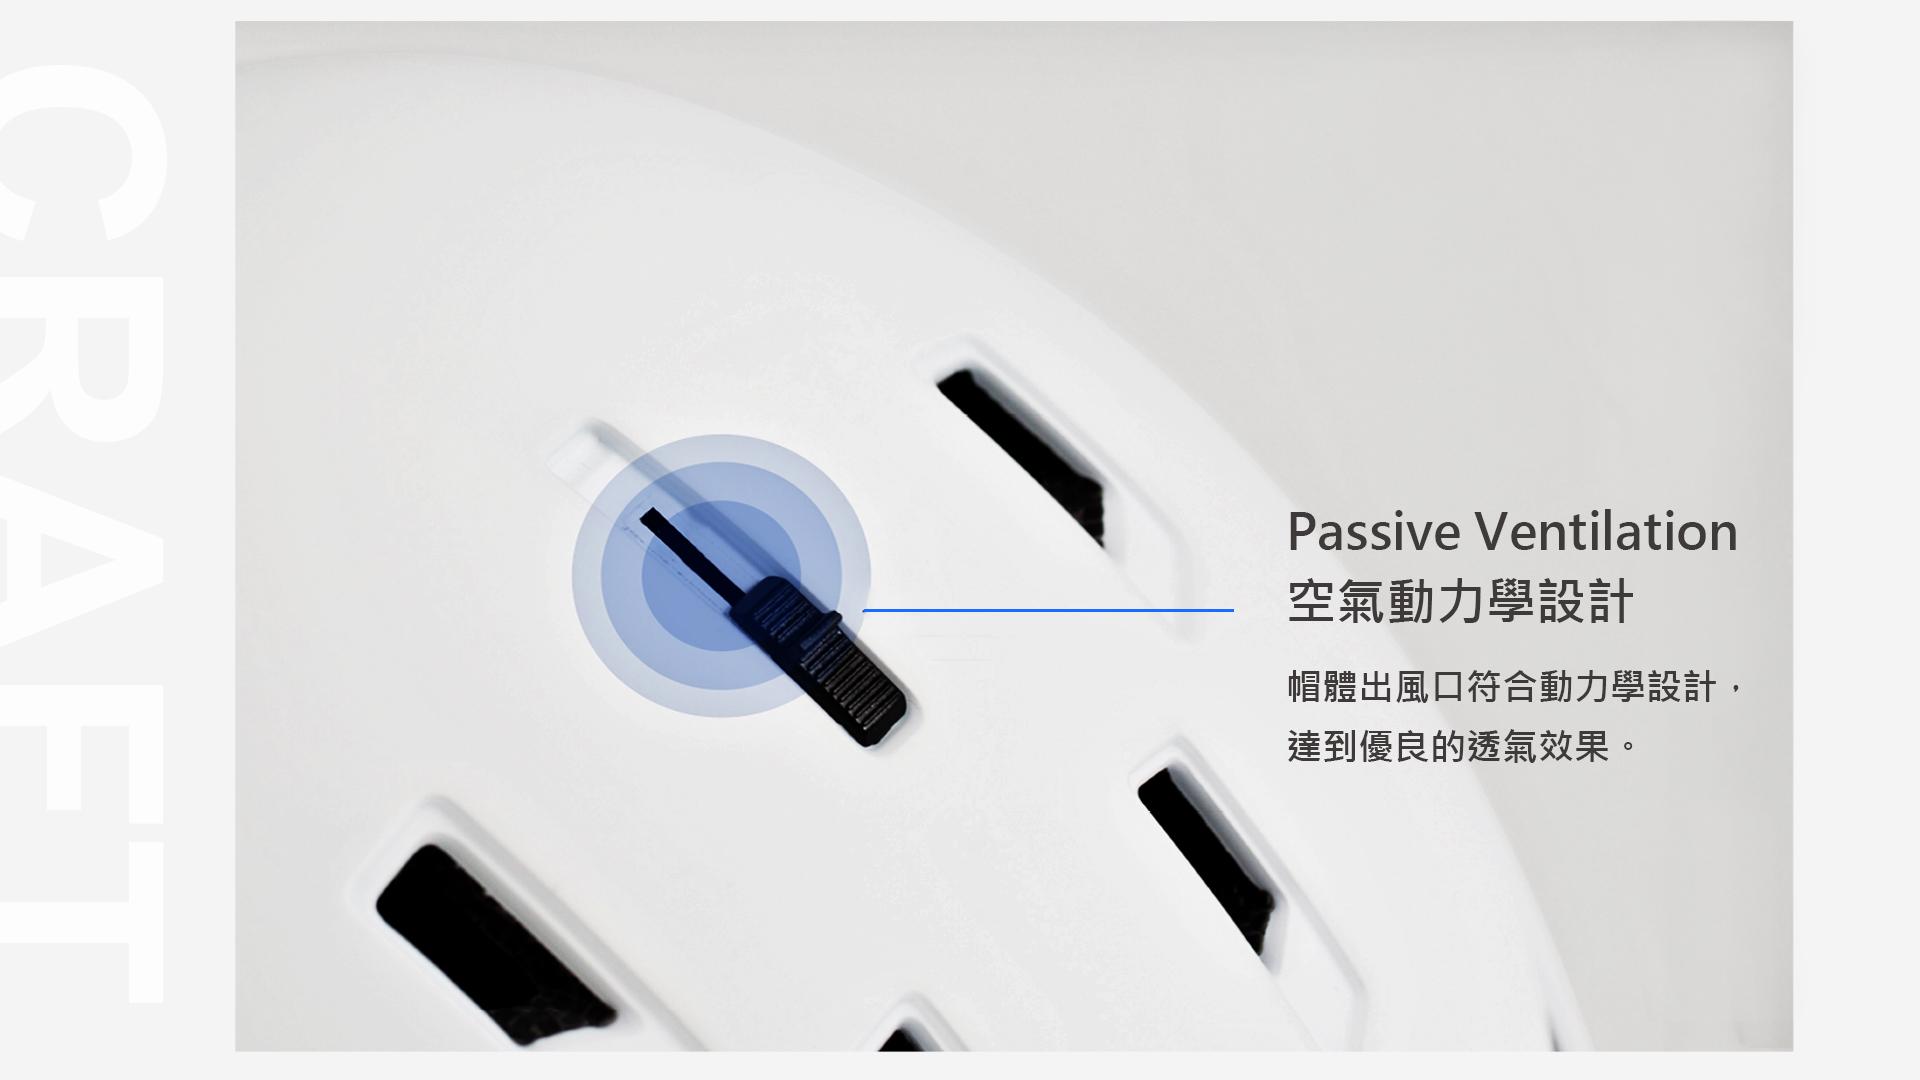 空氣動力學設計 passive ventilation